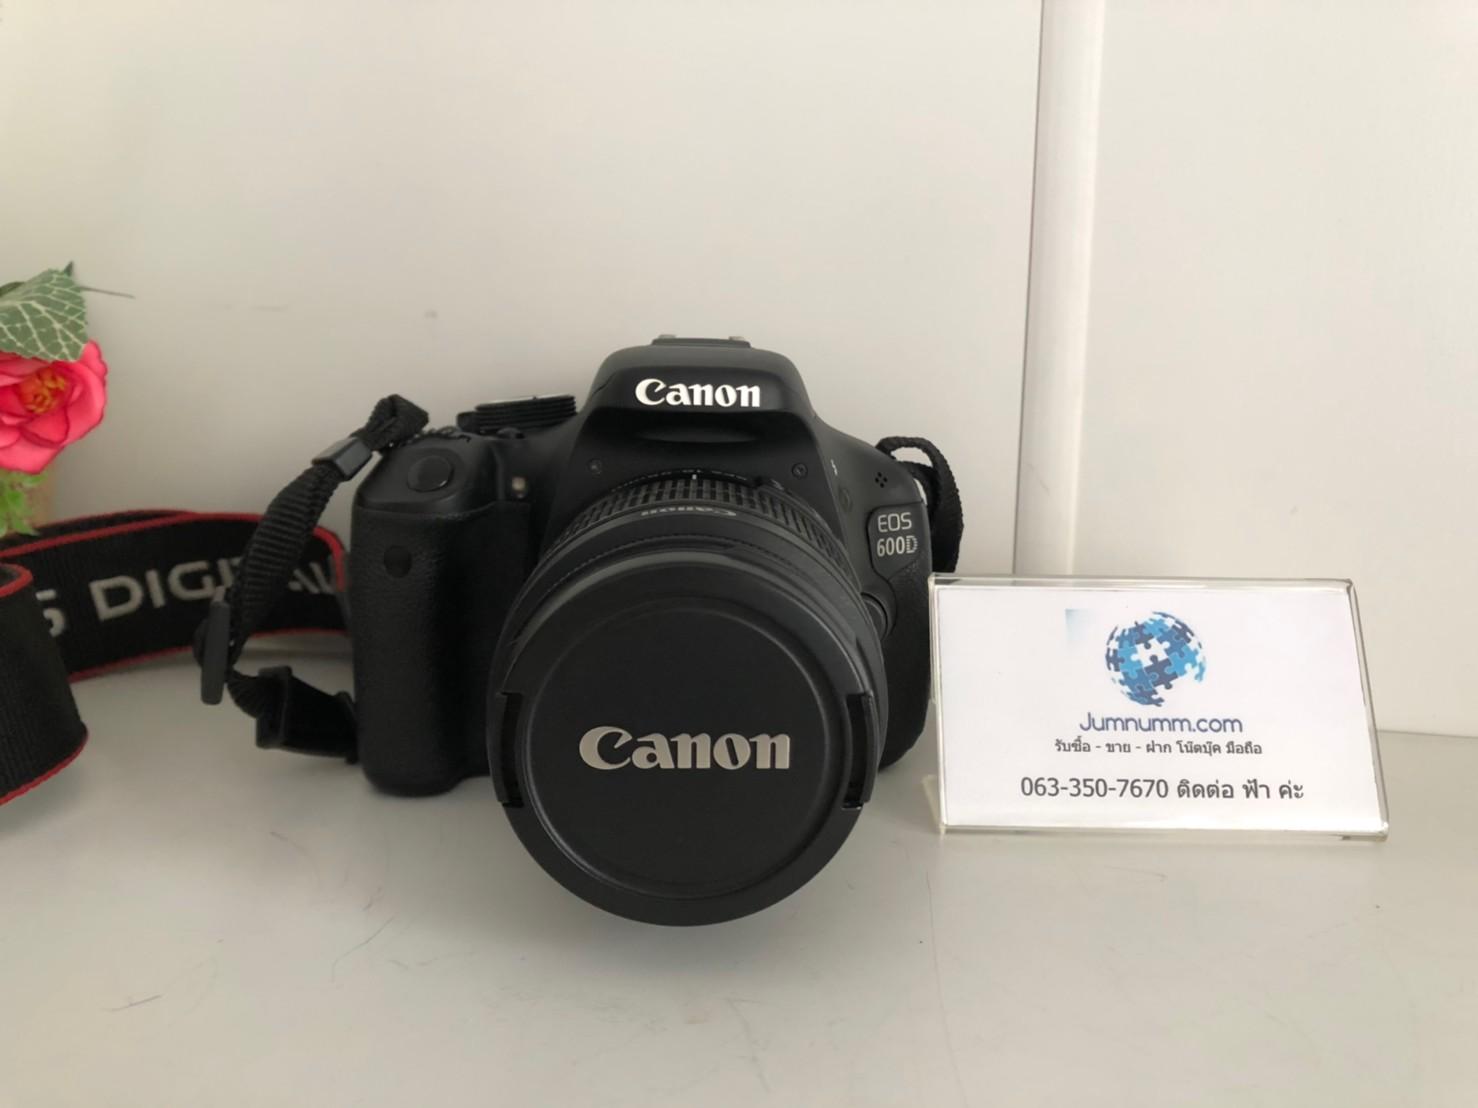 JMM-288 ขายกล้อง Canon 600D +Lens 18-55mm